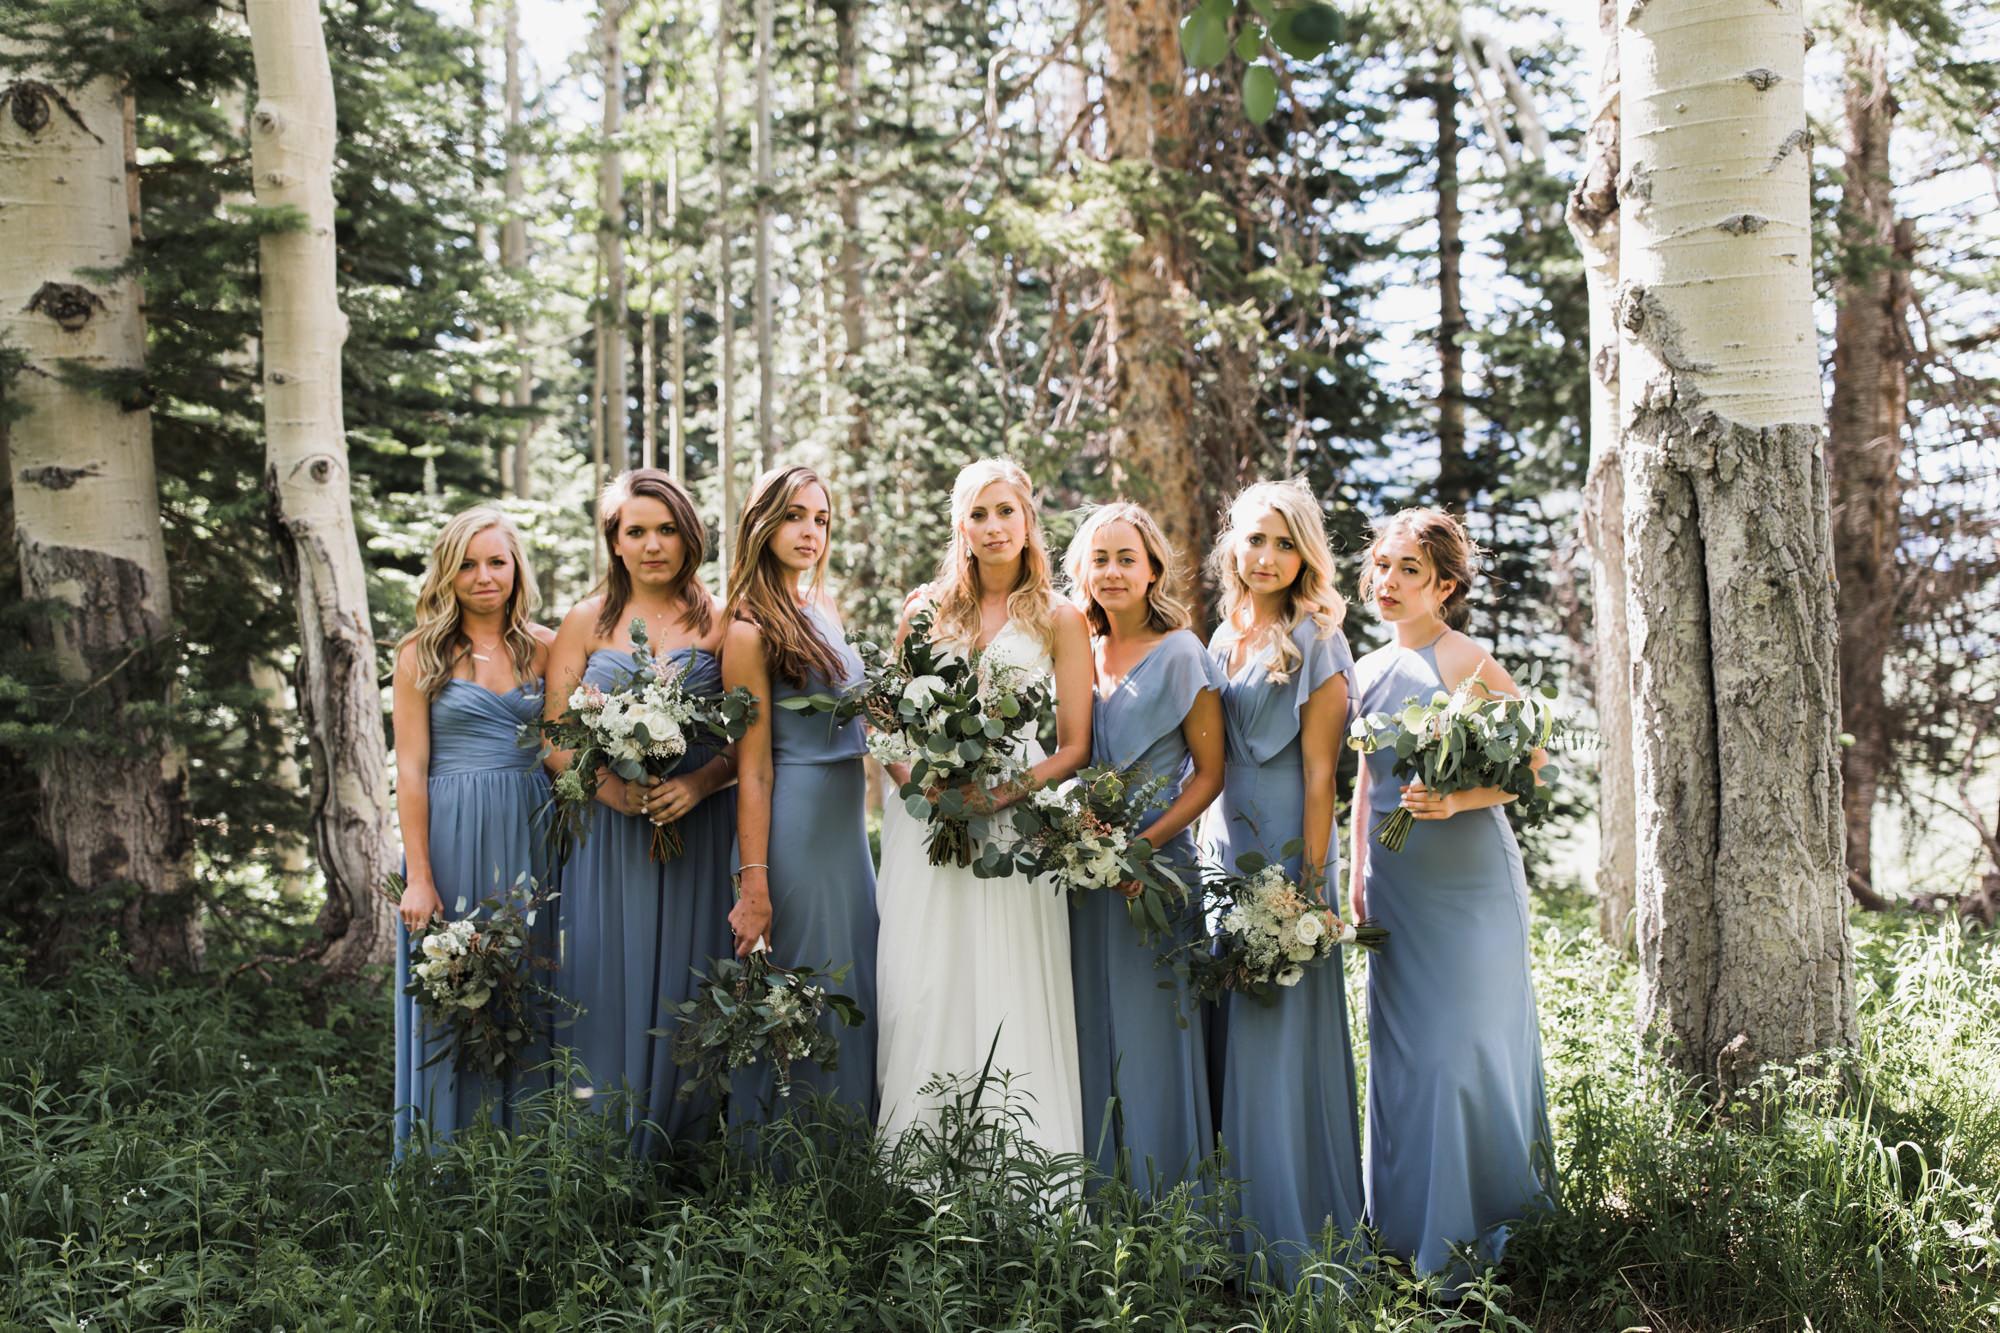 laurann + matt's intimate wedding | ten peaks ceremony site | crested butte mountain resort | colorado wedding photographer | the hearnes adventure photography